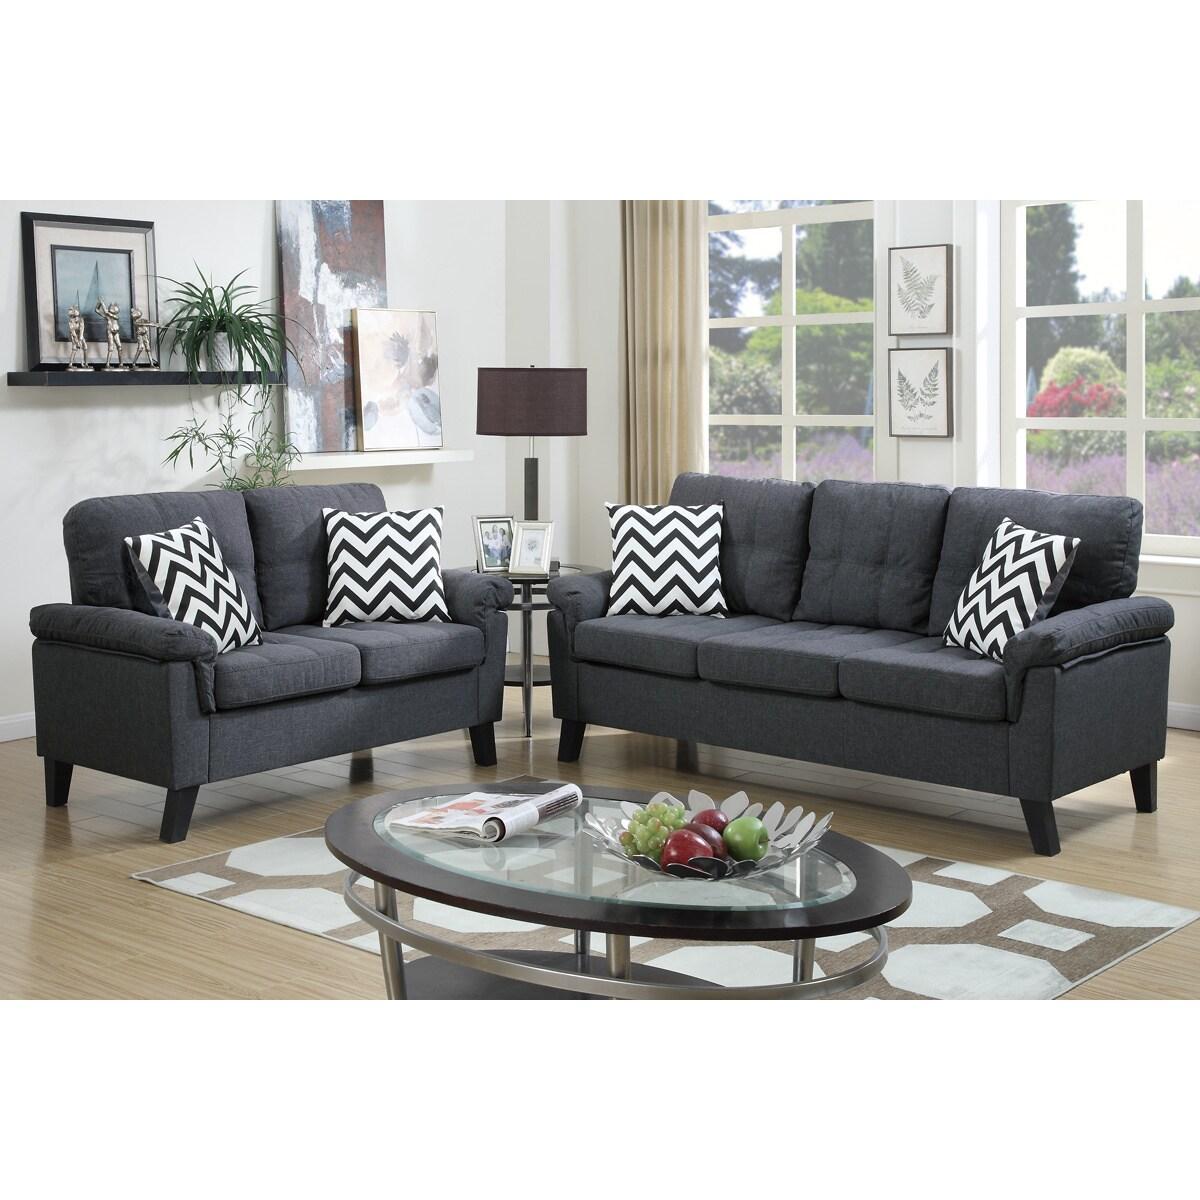 Bobkona Tyler Linen Like 2 Piece Sofa And Loveseat Set (2 Options Available)